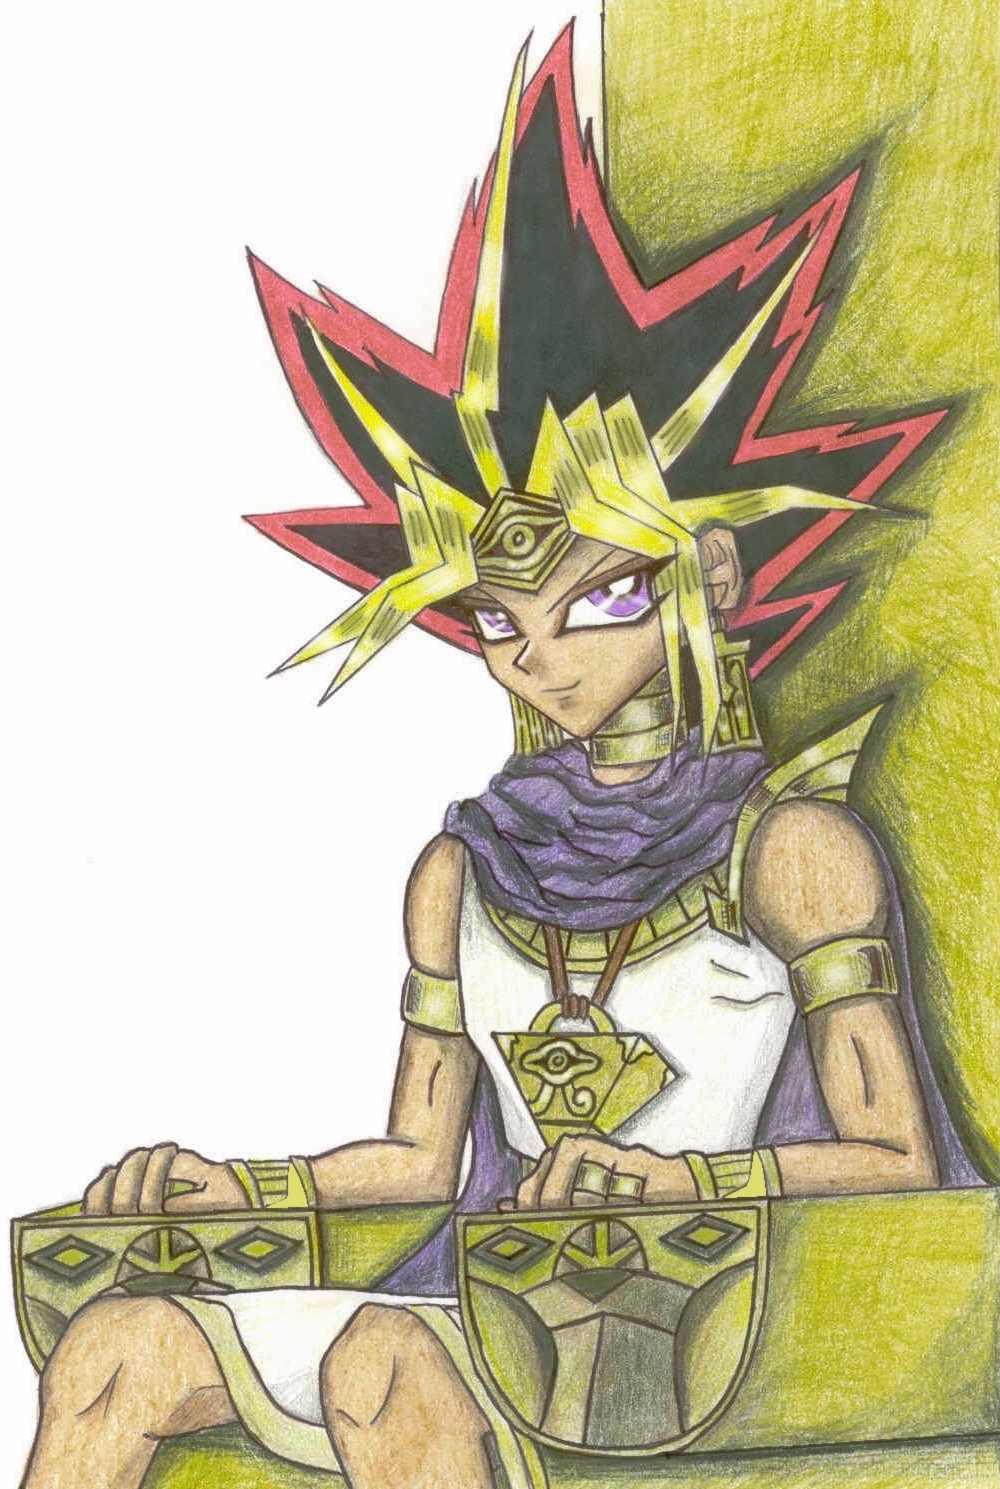 Art Trade for Lex *Pharaoh Atem* by hellpoemer